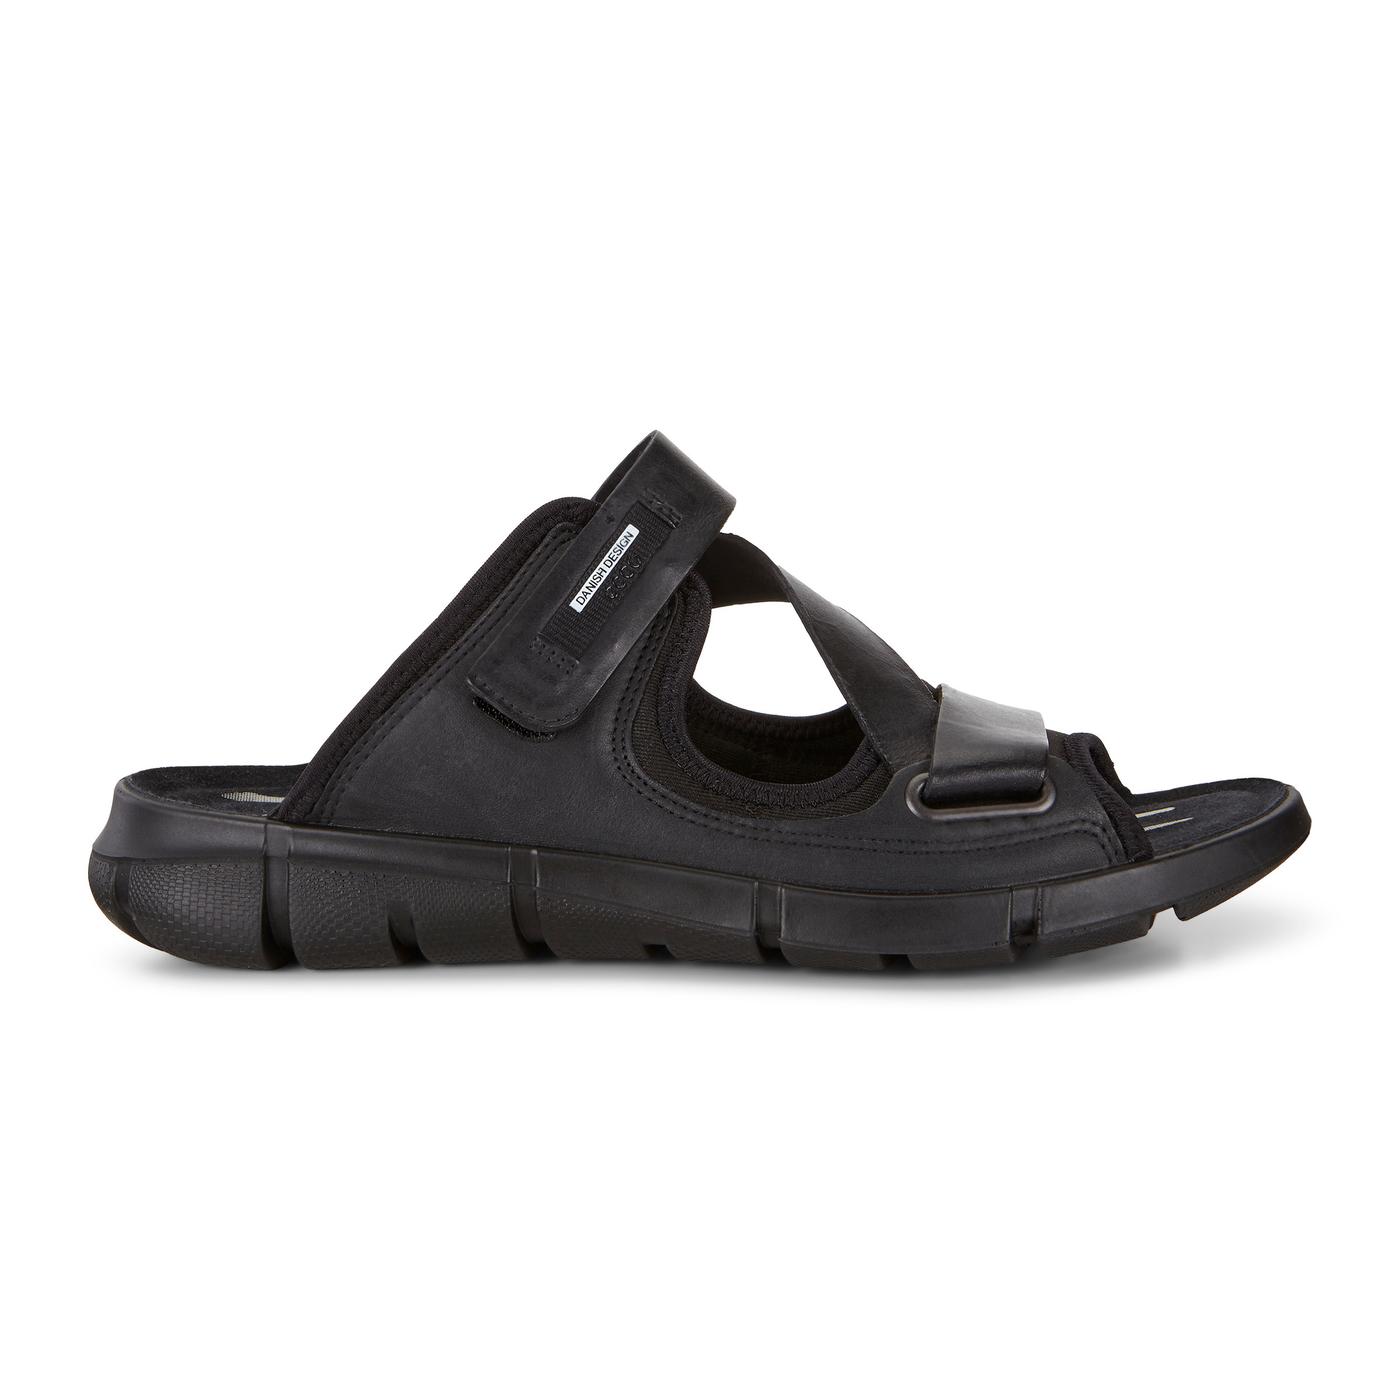 ECCO Intrinsic Sandal Men's